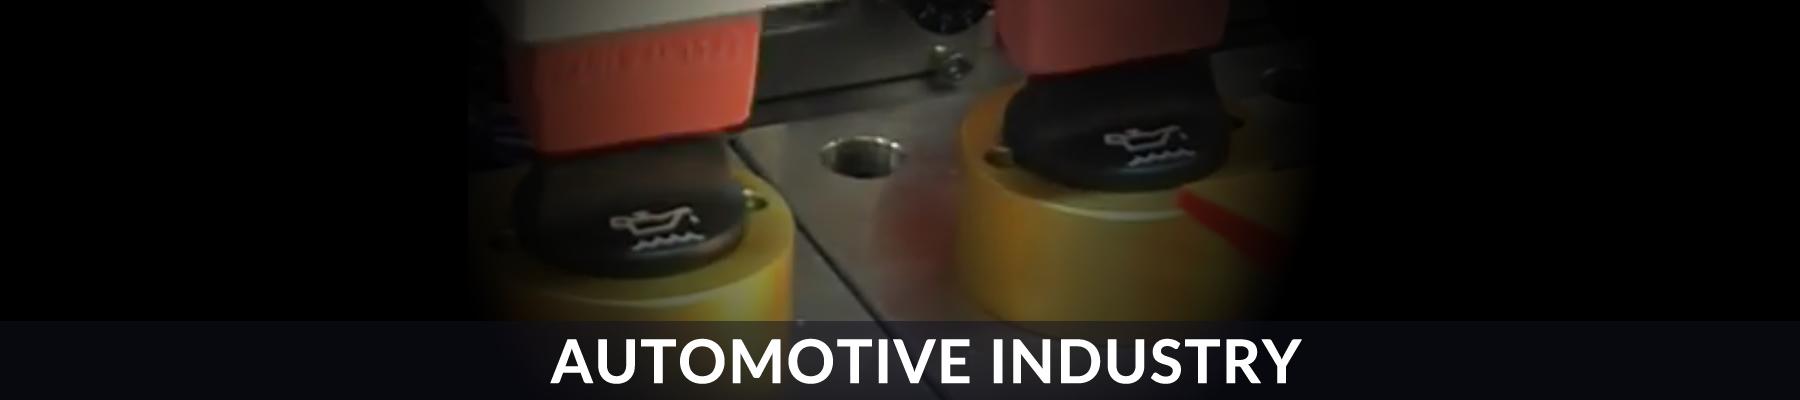 Automotive 1